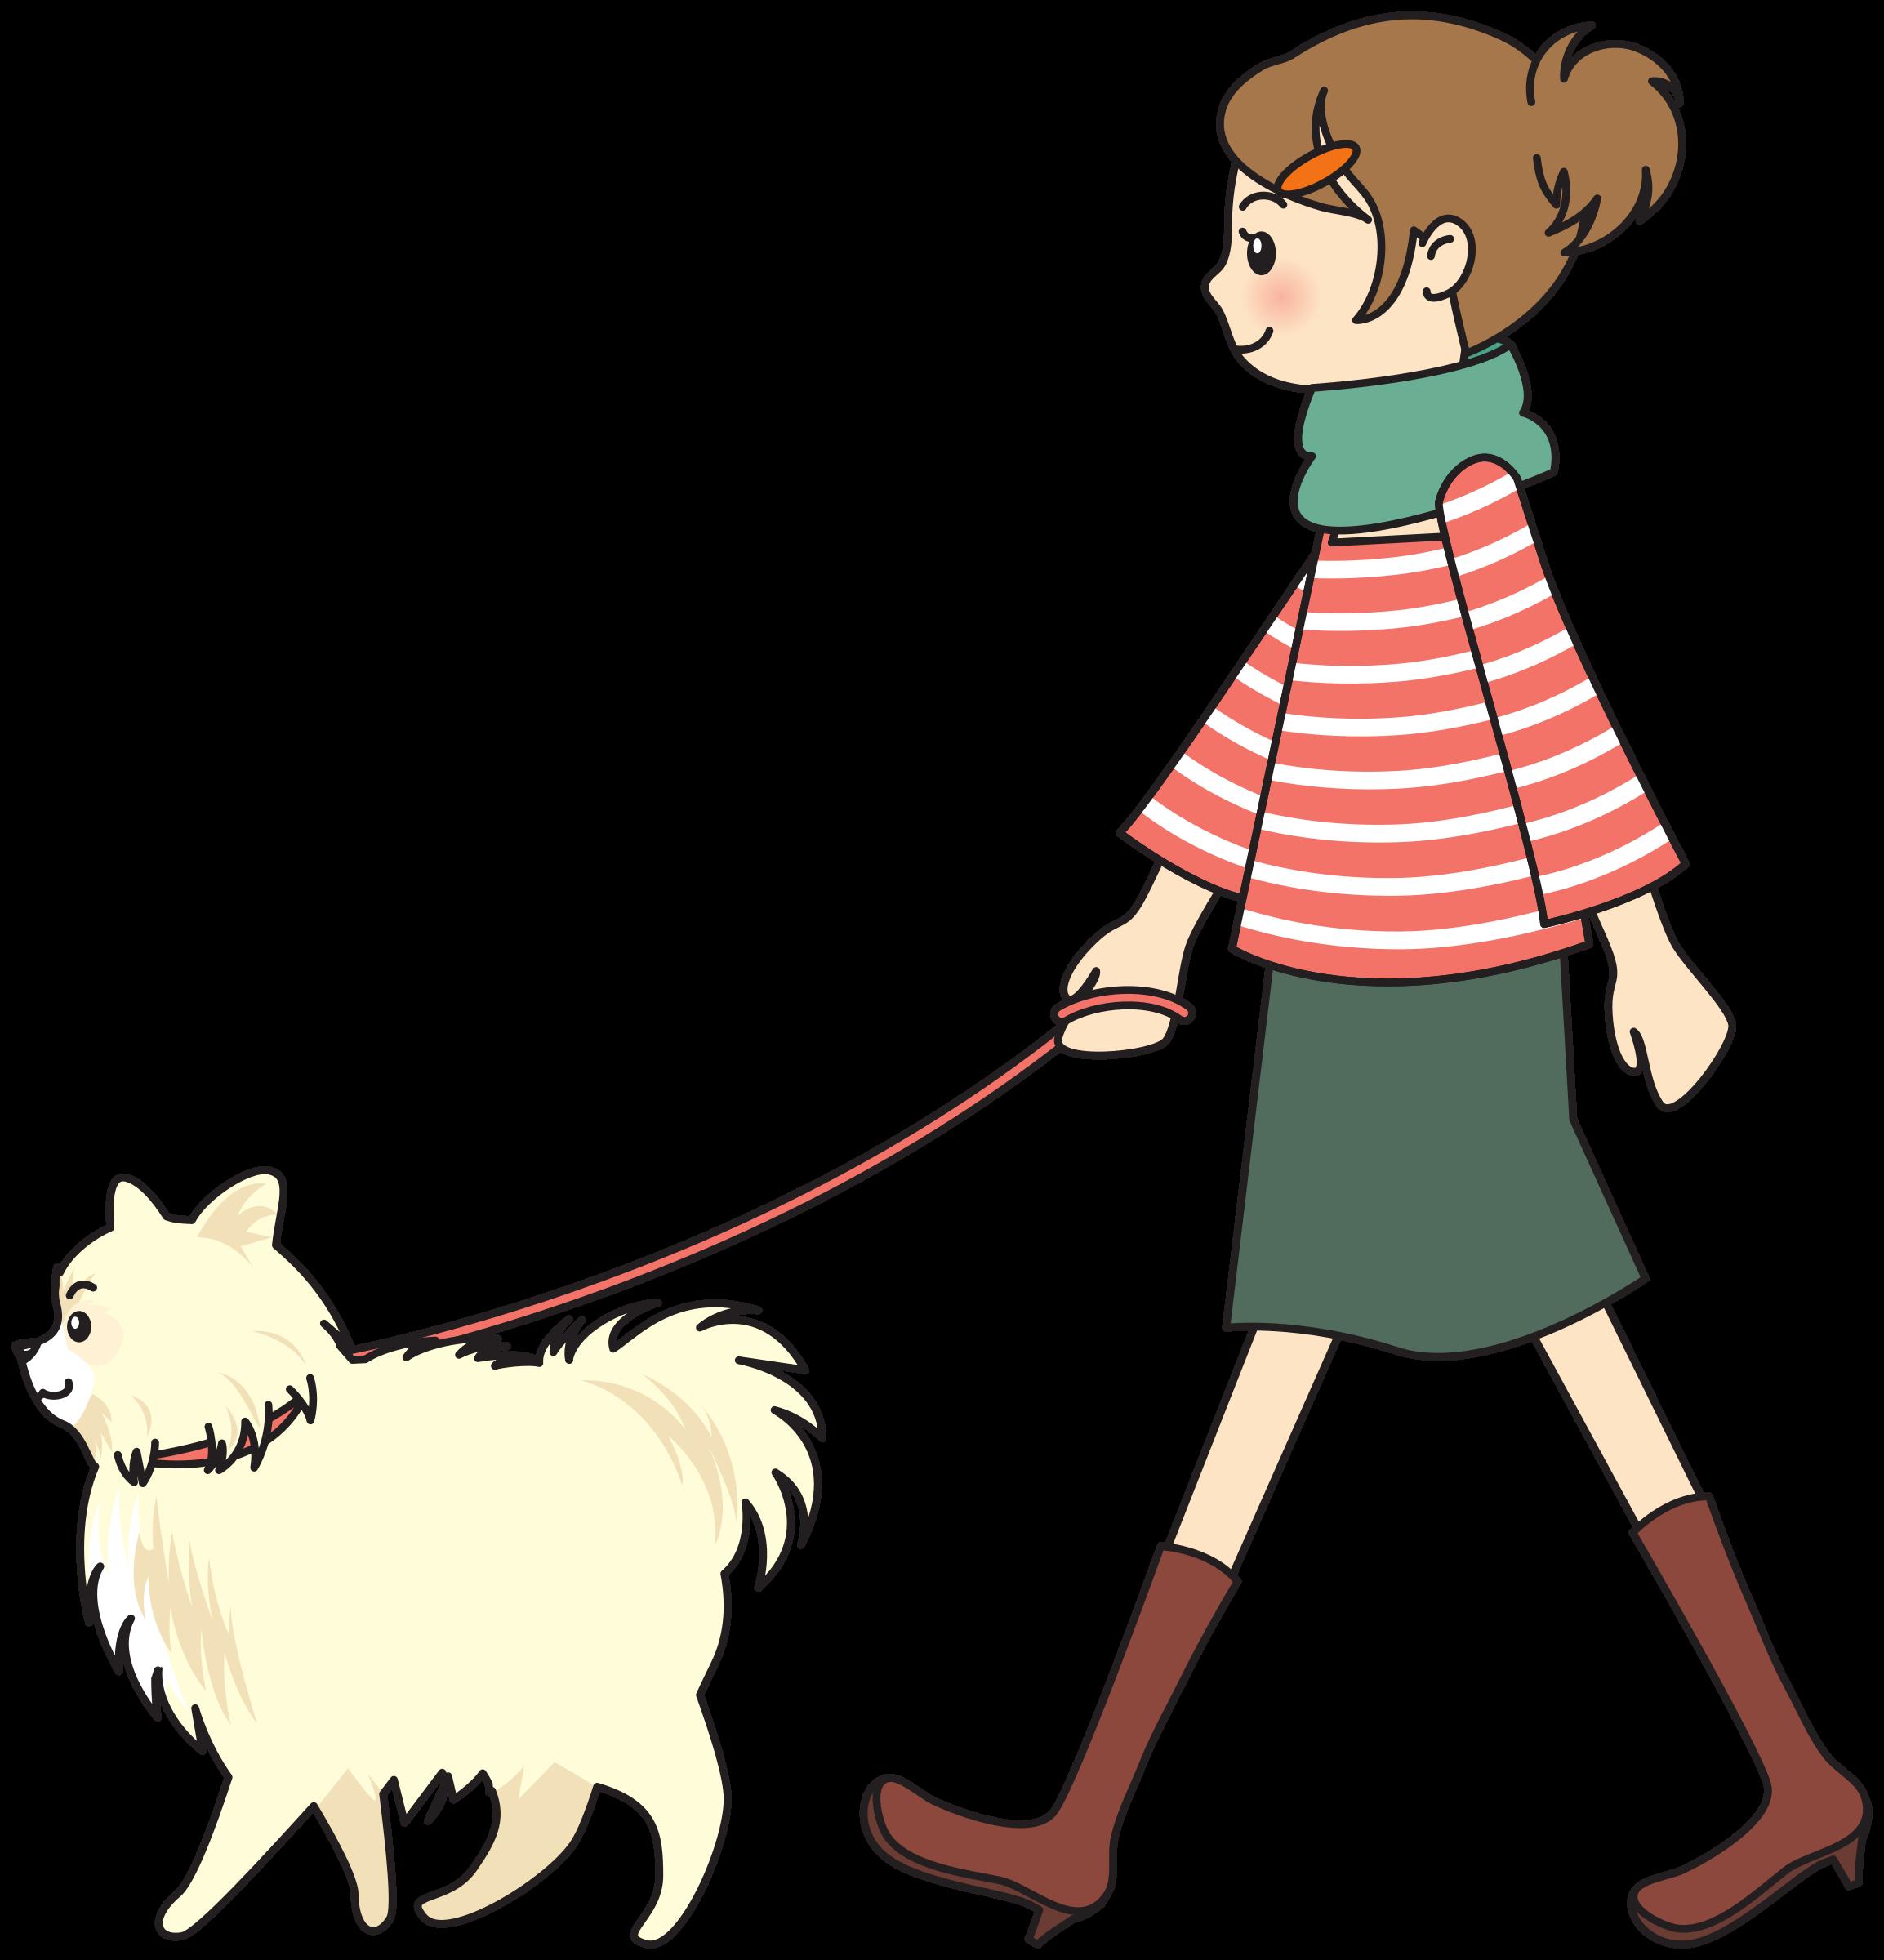 Footprint clipart walking. Dog cliparts free download